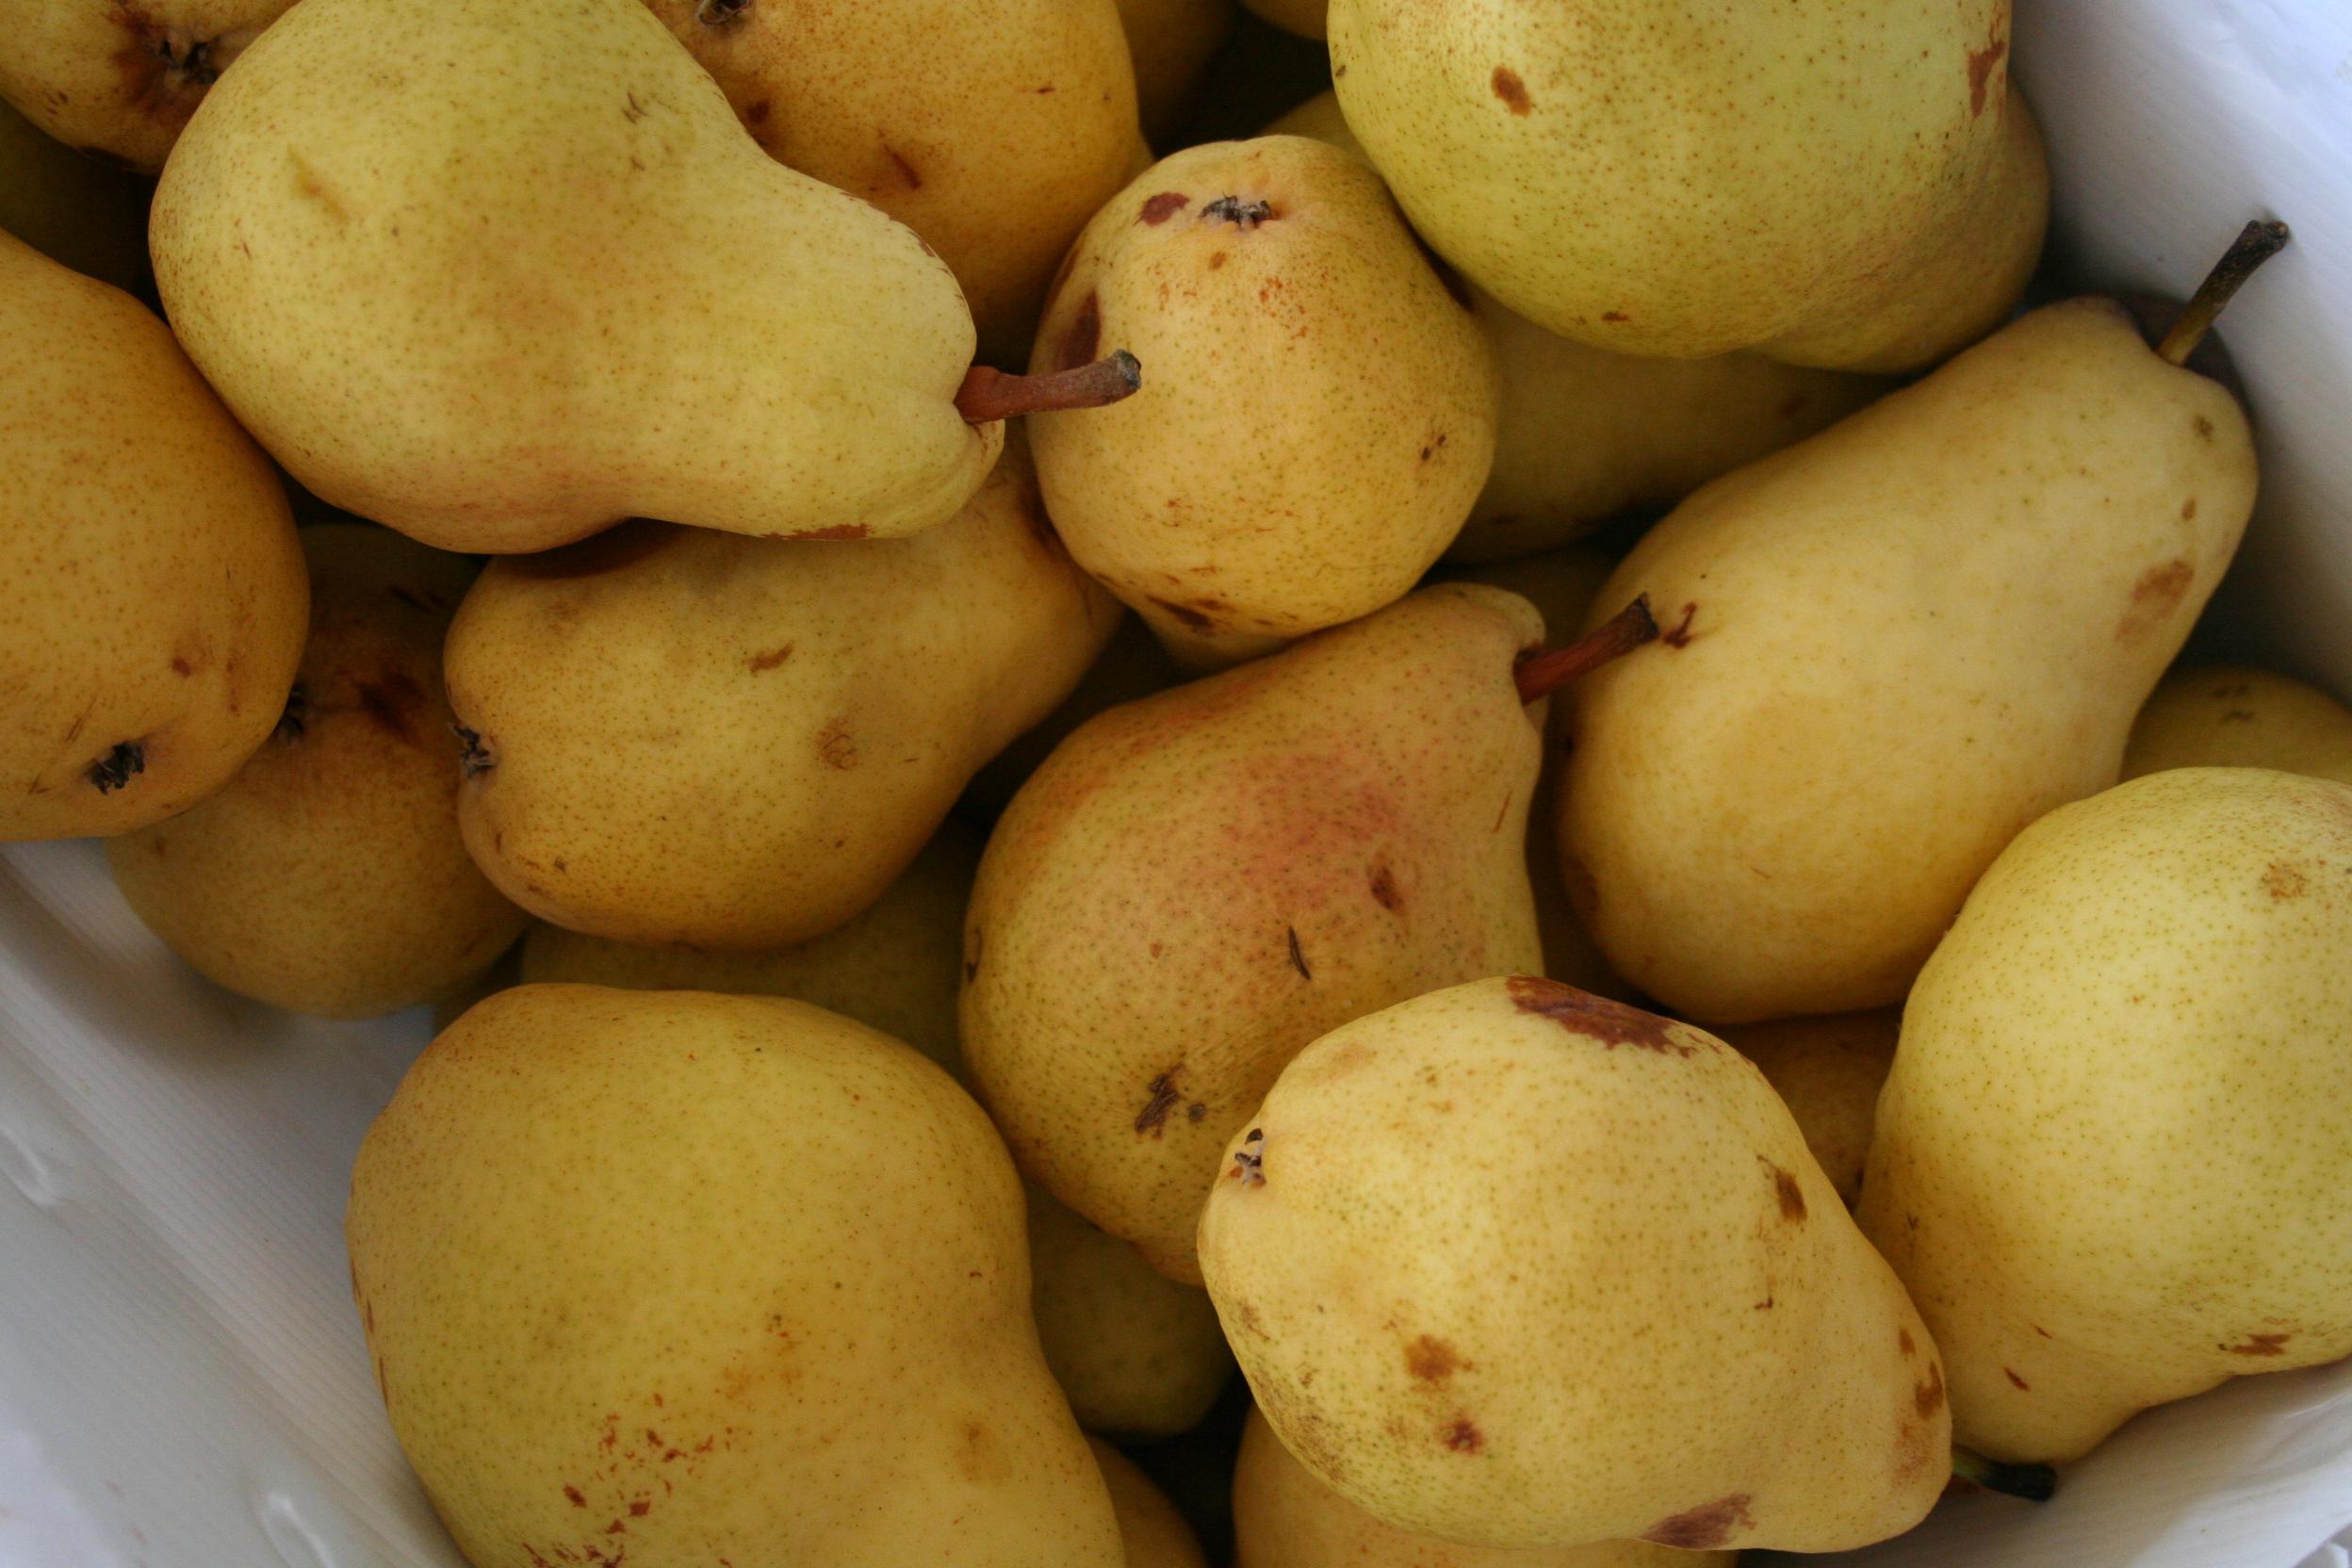 Simple Homemade Pear Sauce Recipe - Coastal Collective Co. blog